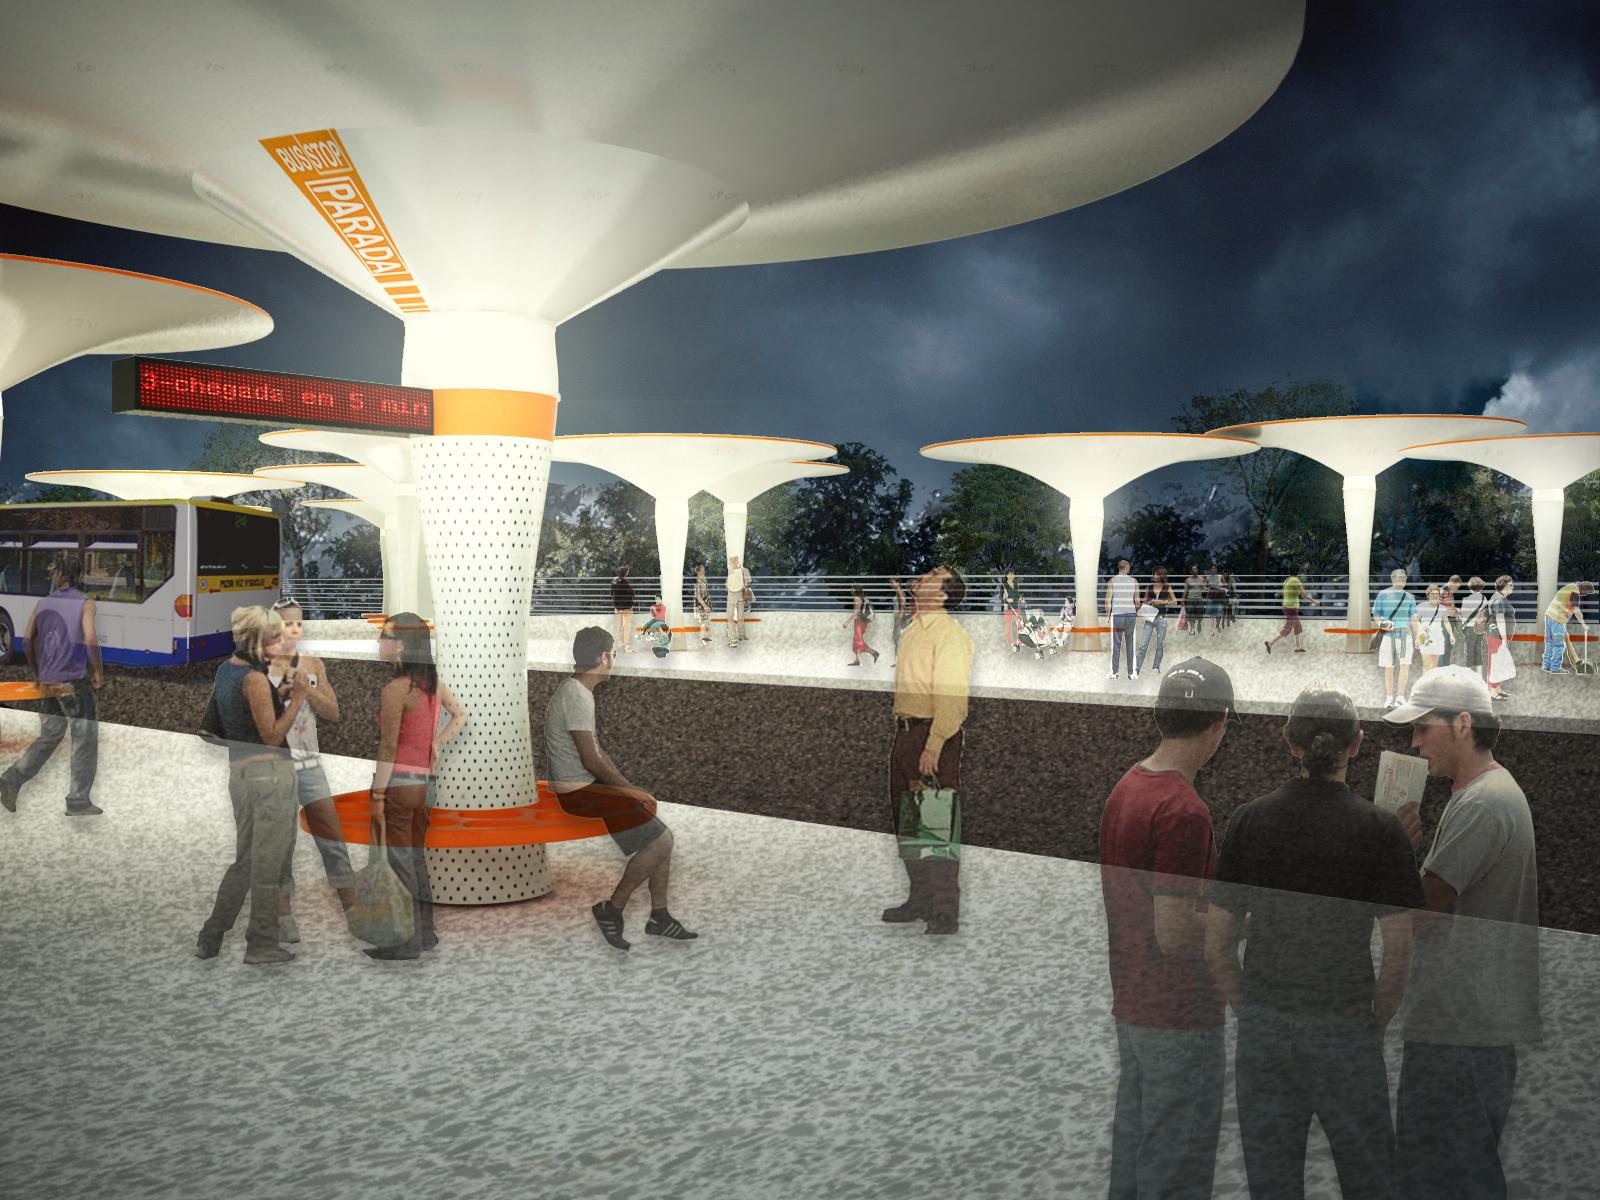 mobiliario jardim jumbo:Studio Lauria propõe mobiliário urbano que gera energia e armazena